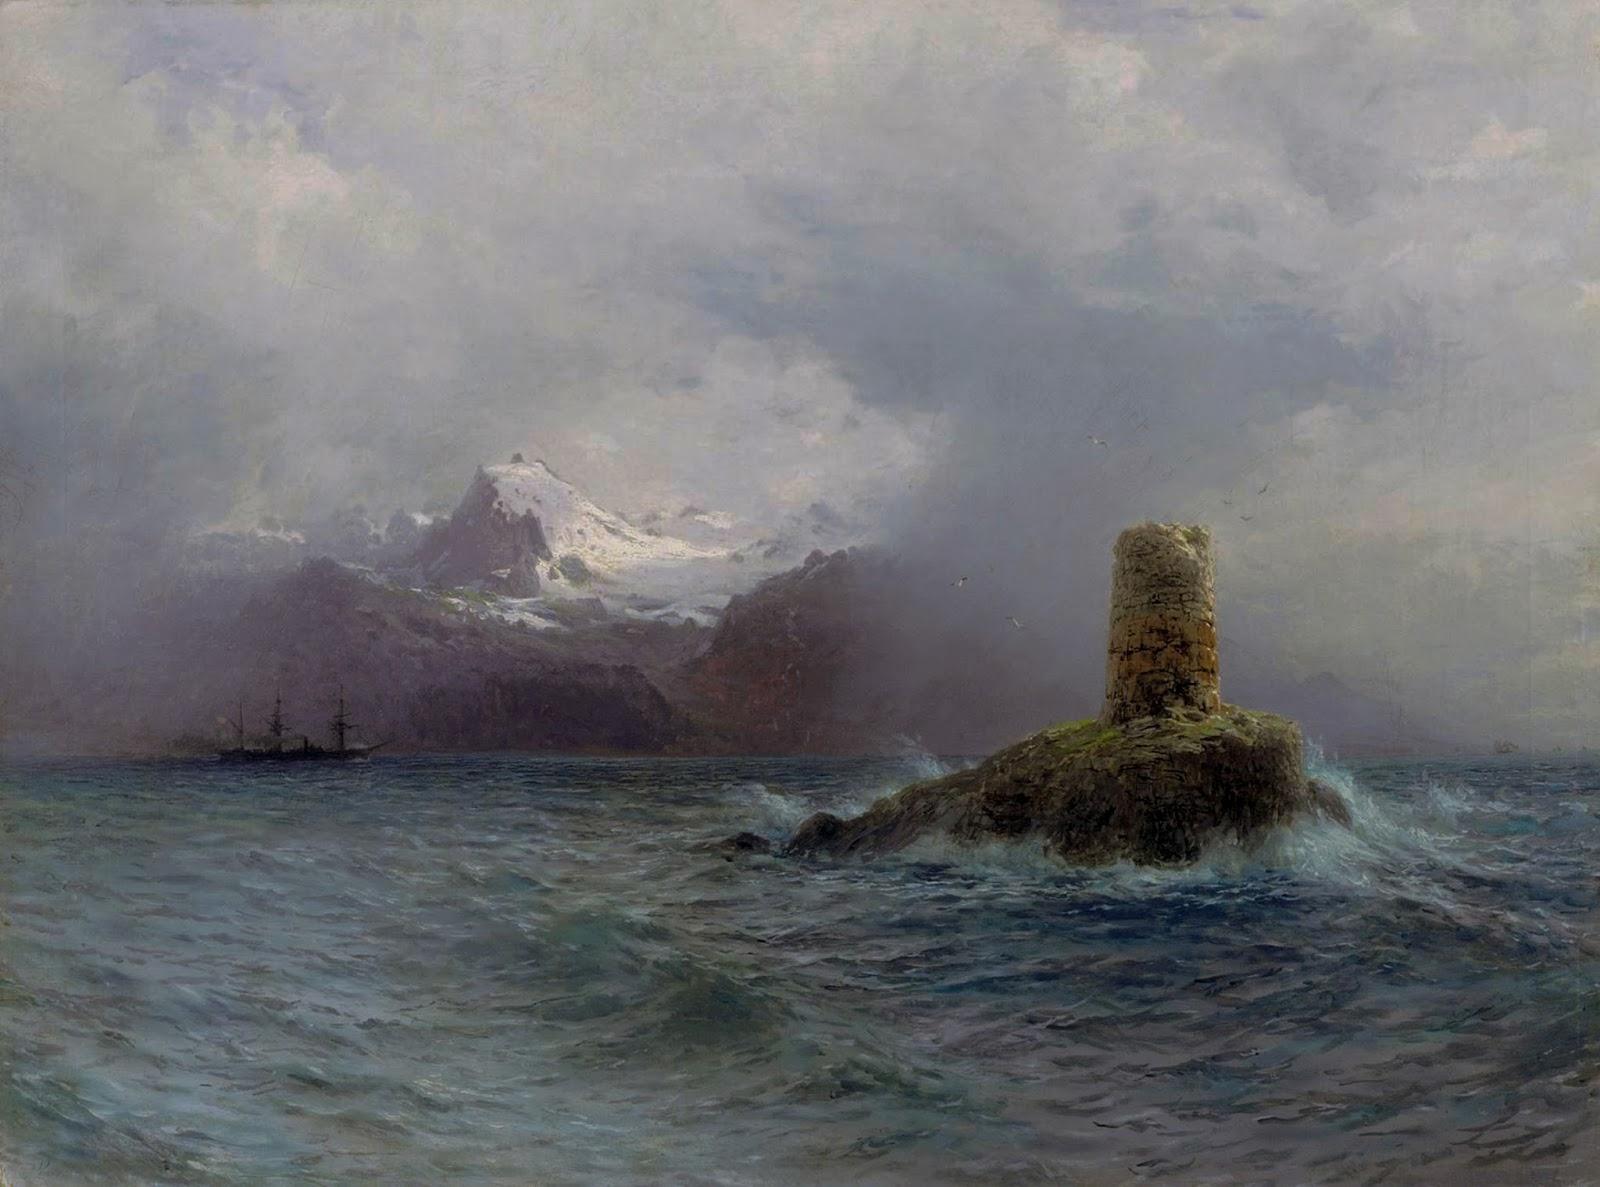 Море в живописи - картины - Море в живописи ( морские пейзажи, seascapes ) фото